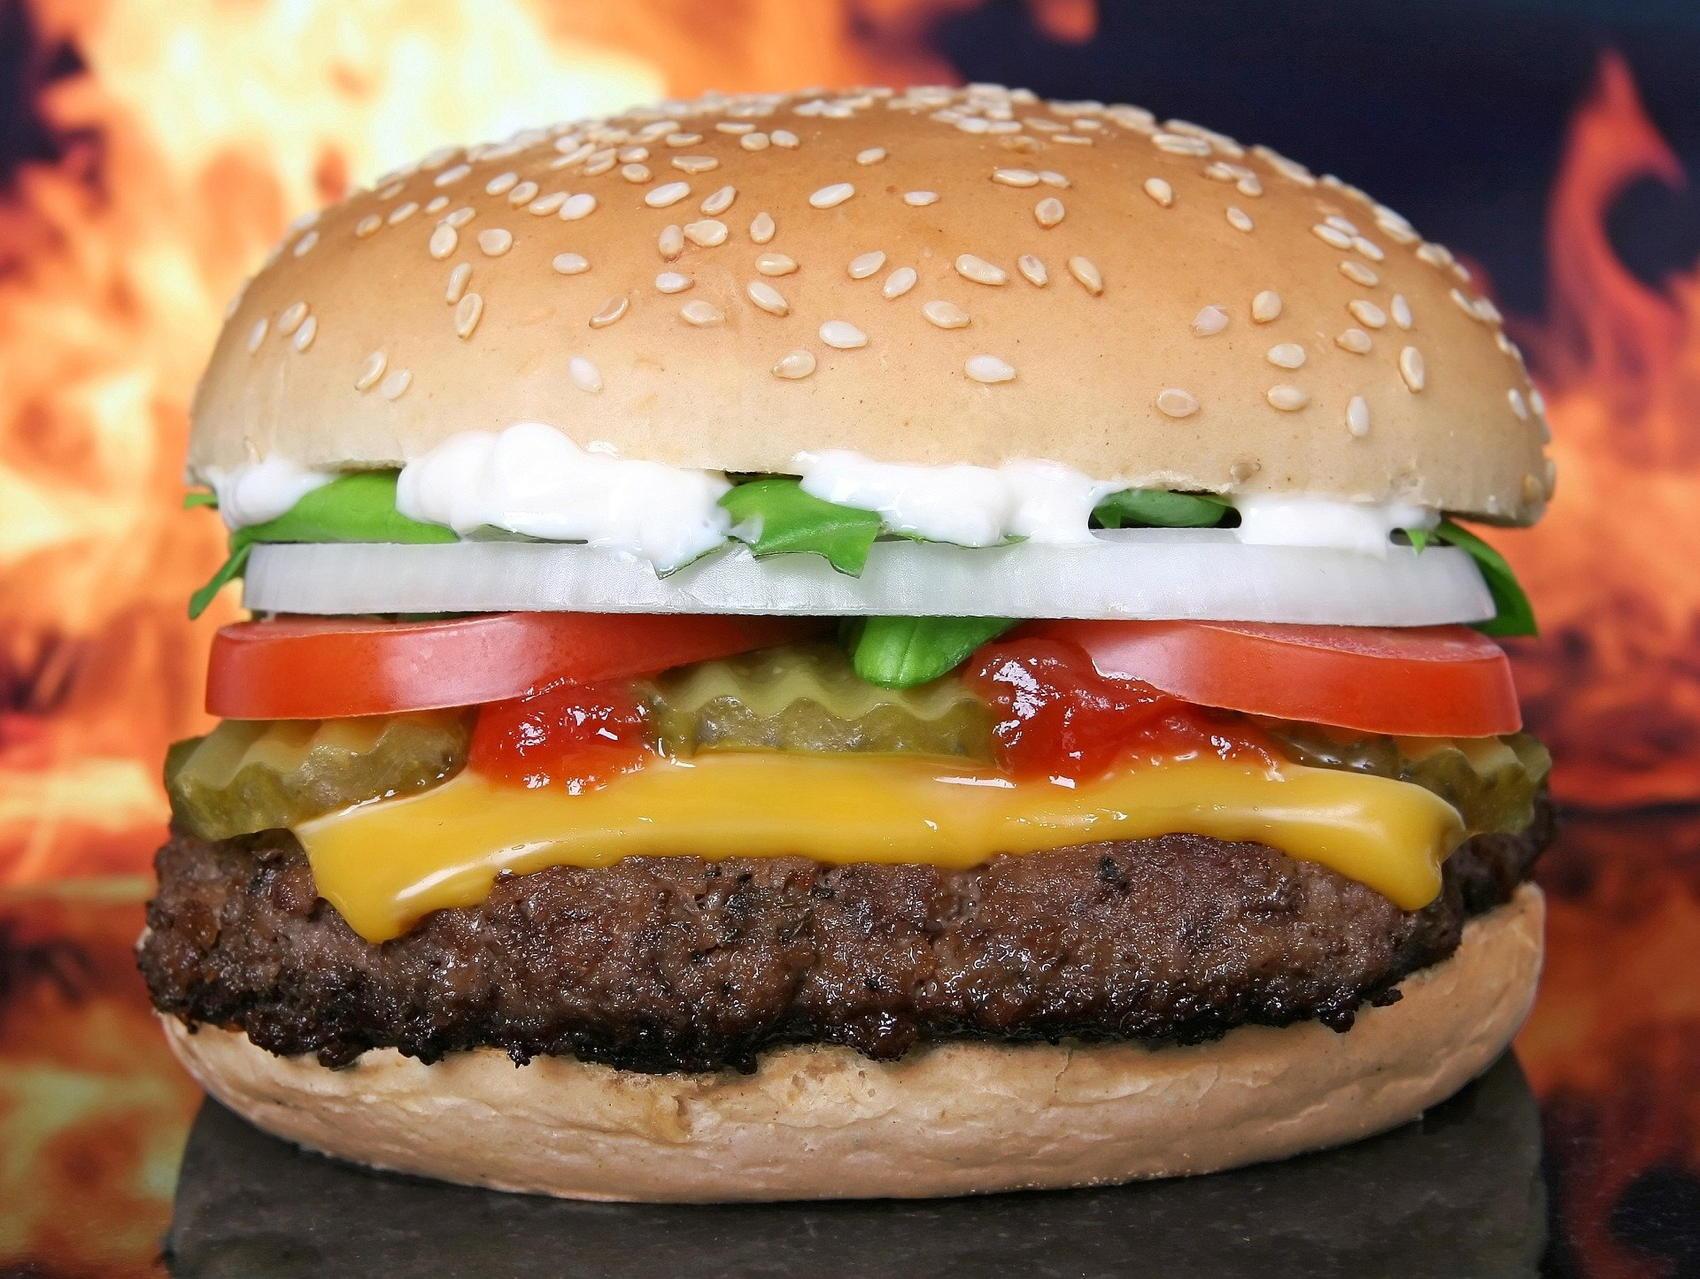 McDonald's Hamburger - Image by Shutterbug75